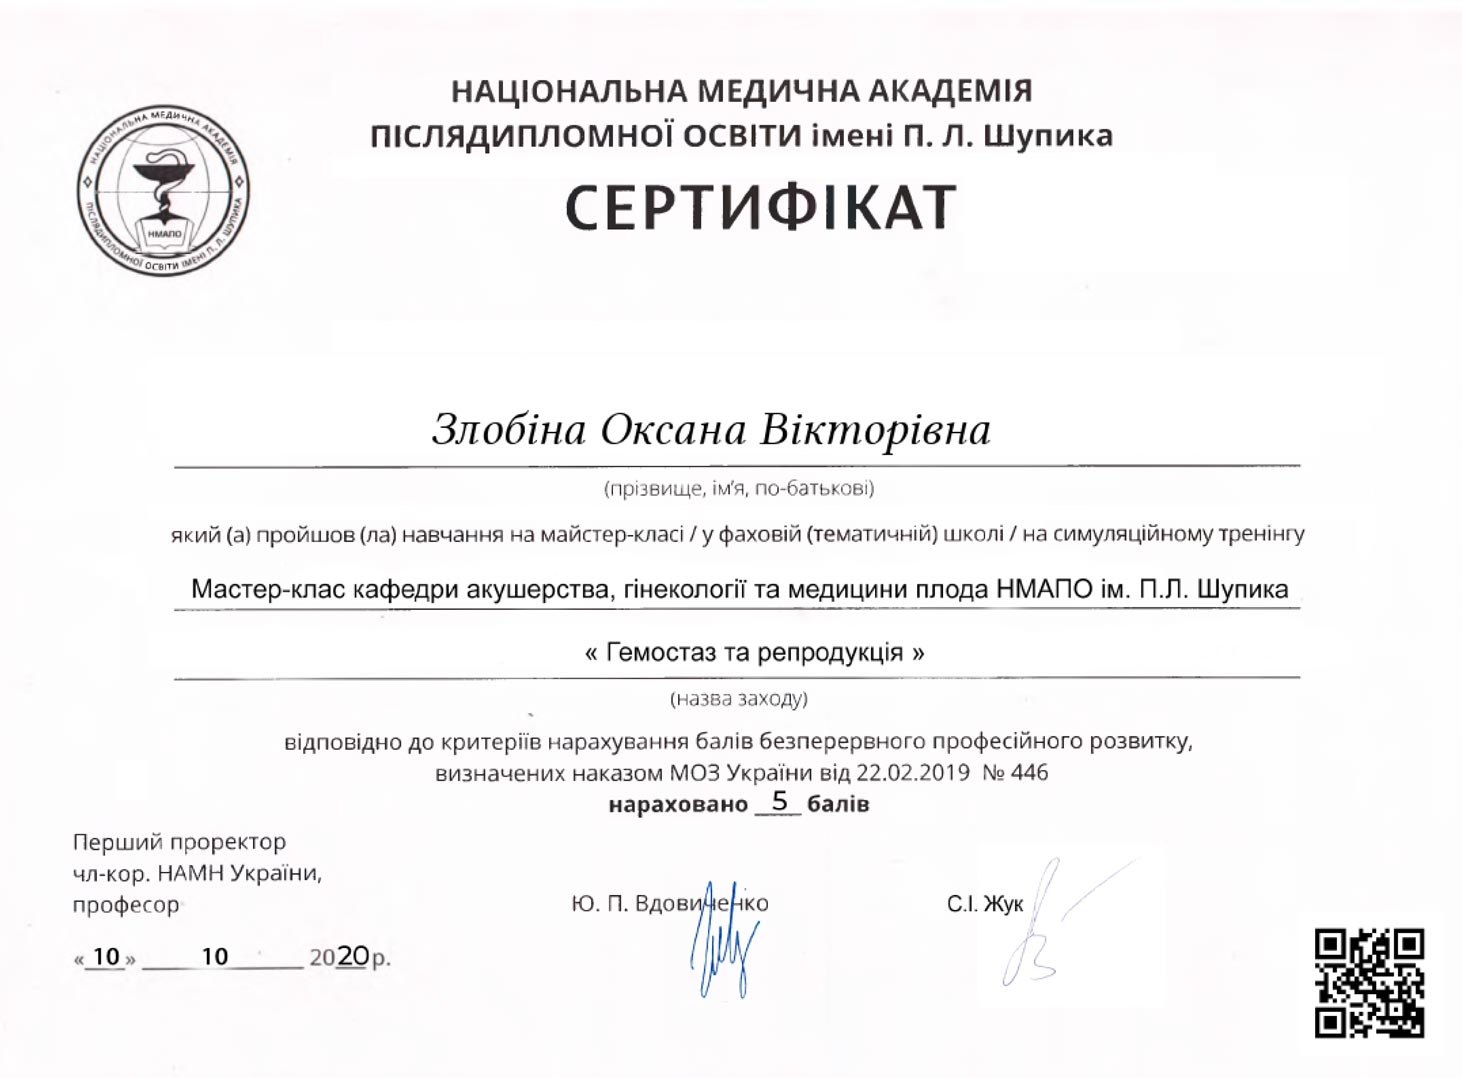 Сертификат №44